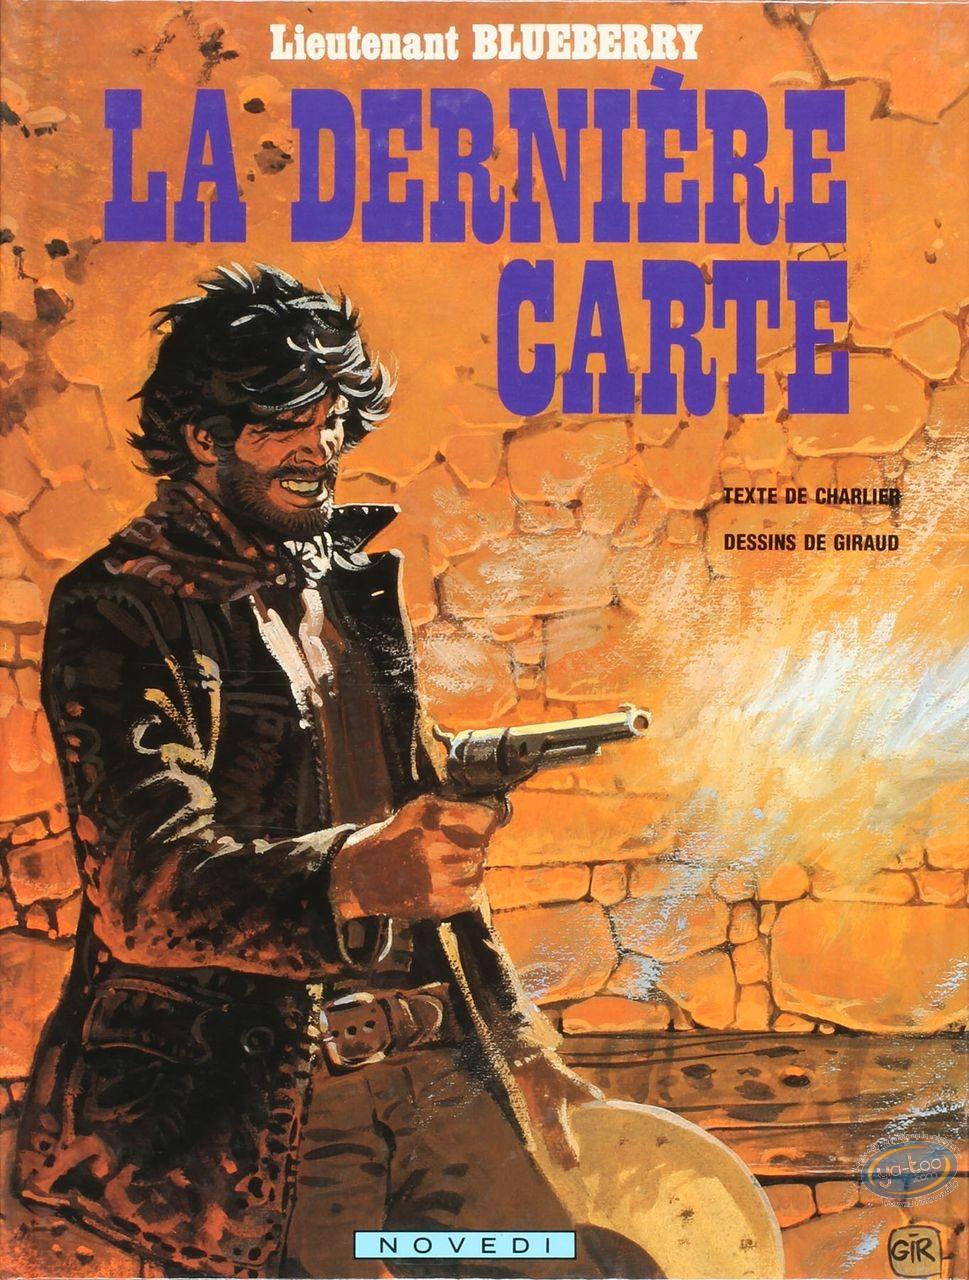 Listed European Comic Books, Blueberry : La derniere carte